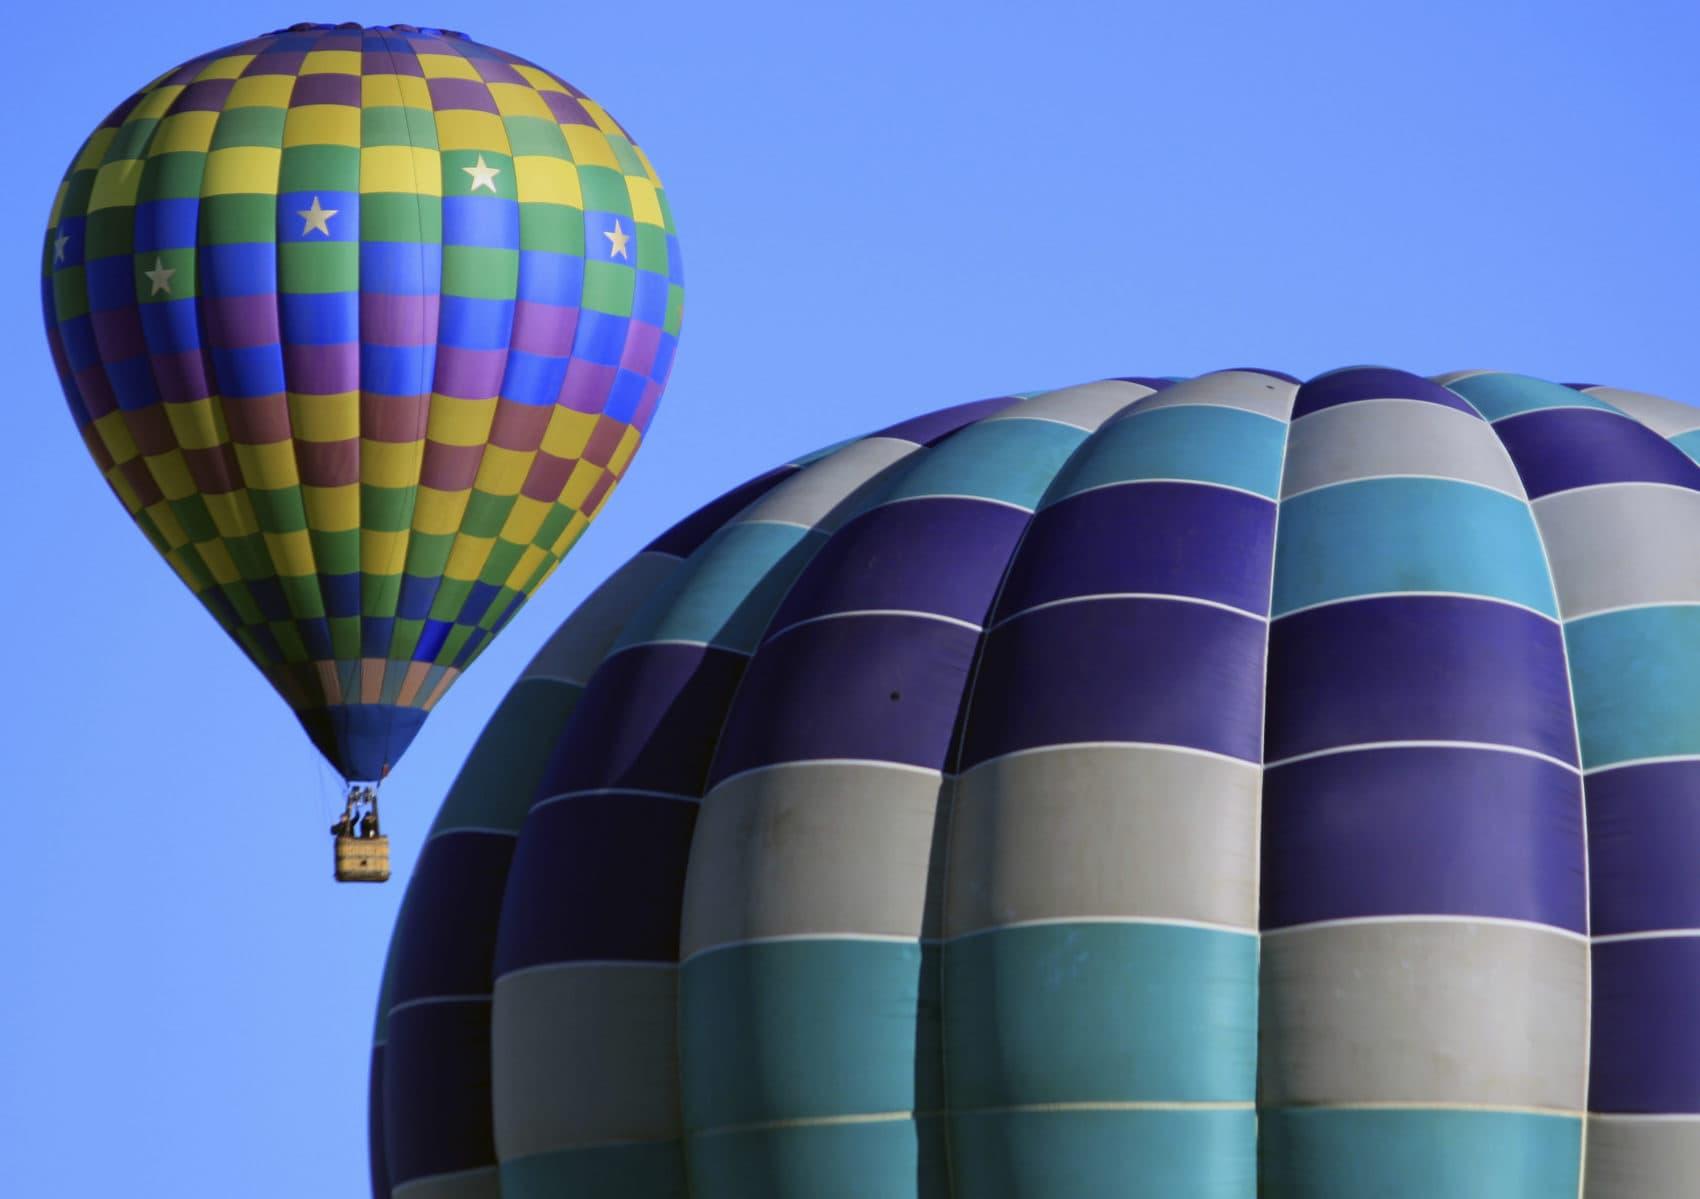 Hot air balloons participating in the Albuquerque International Balloon Fiesta float over Albuquerque, N.M., Oct. 10, 2017. The 47th Albuquerque International Balloon Fiesta is set to start Saturday, Oct. 6, 2018. (Susan Montoya Bryan/AP)